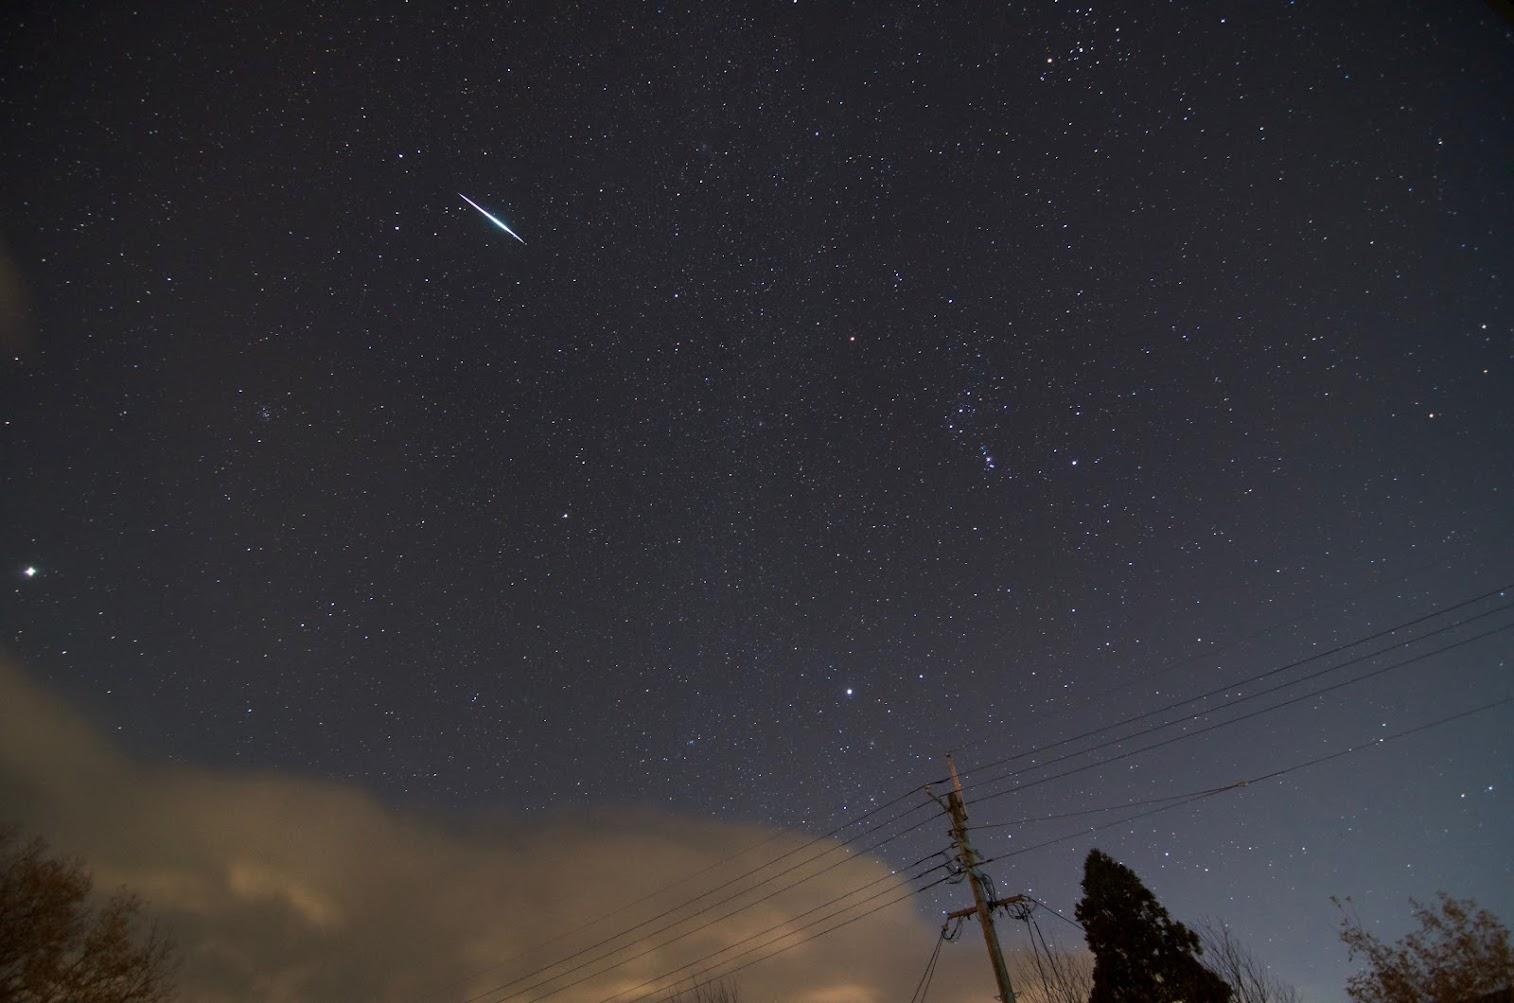 A Bright Geminid Meteor